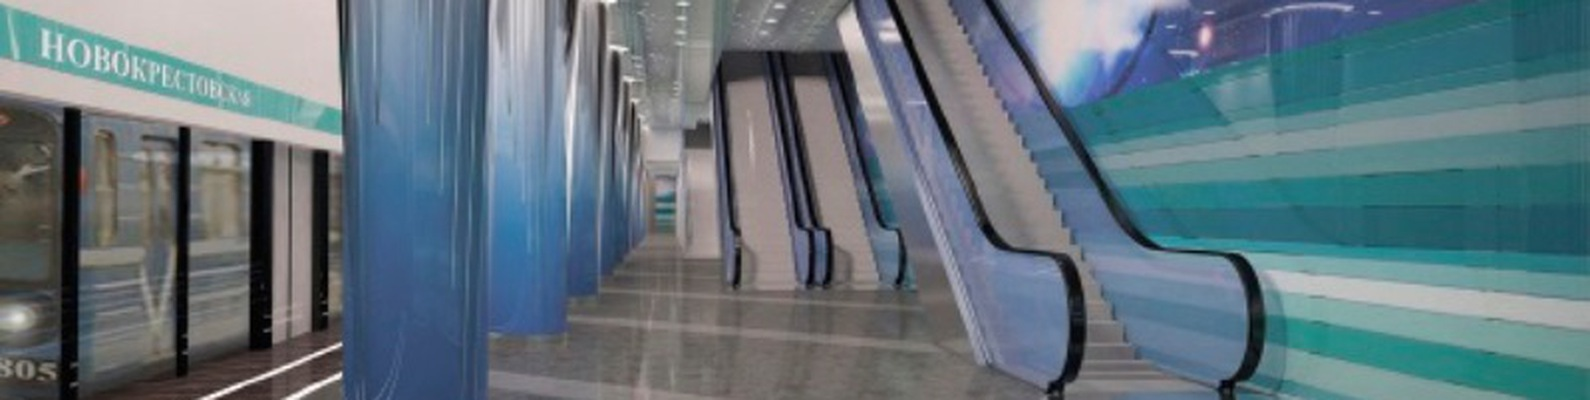 аренда машин в спб у метро